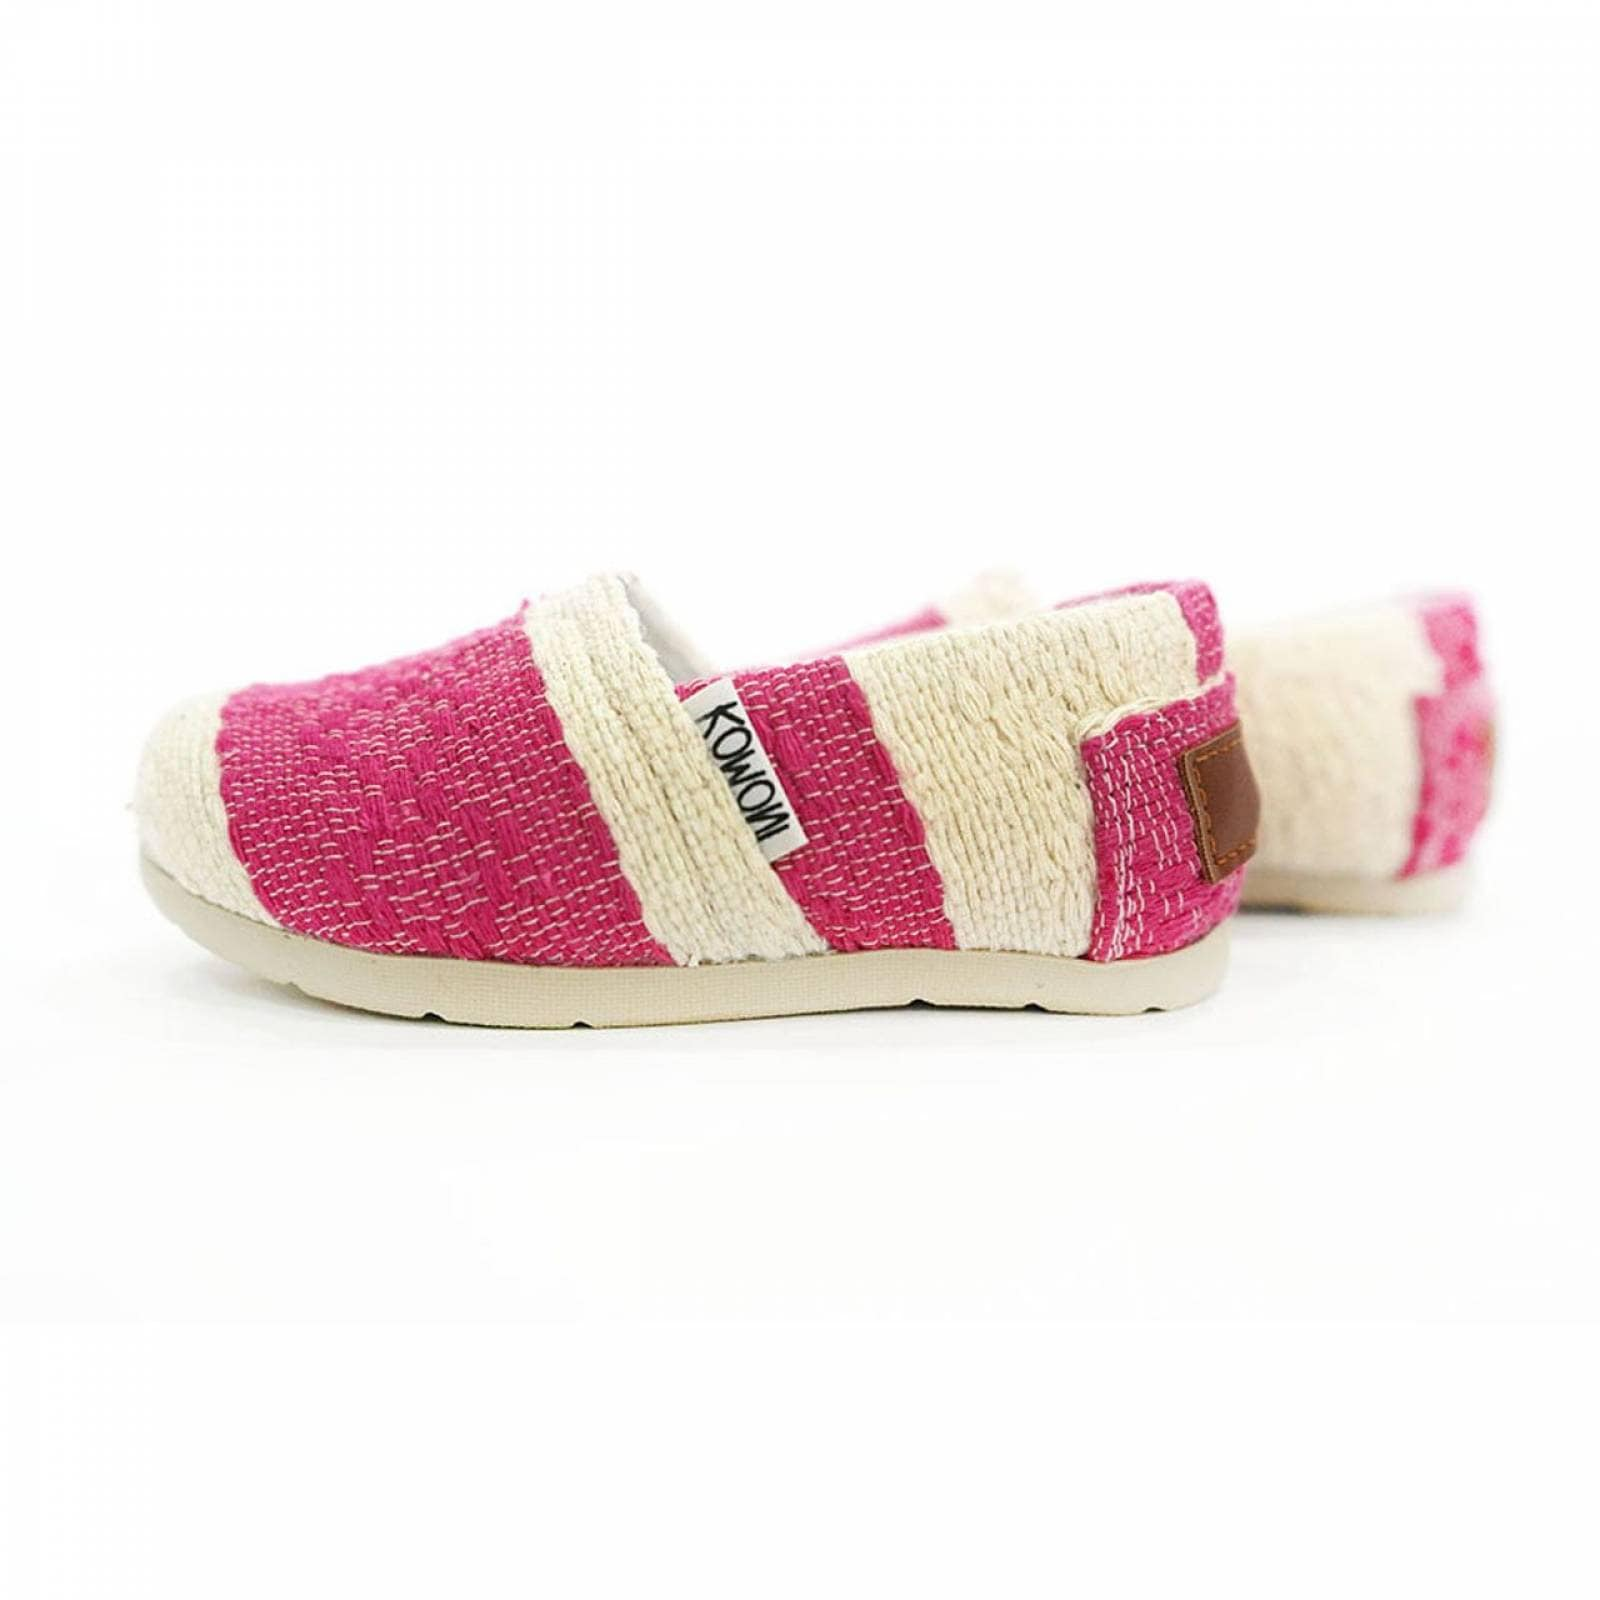 Zapato Alpargata Mini Jacinta Artesanal Tela Infantil Rosa Komoni Talla: 18